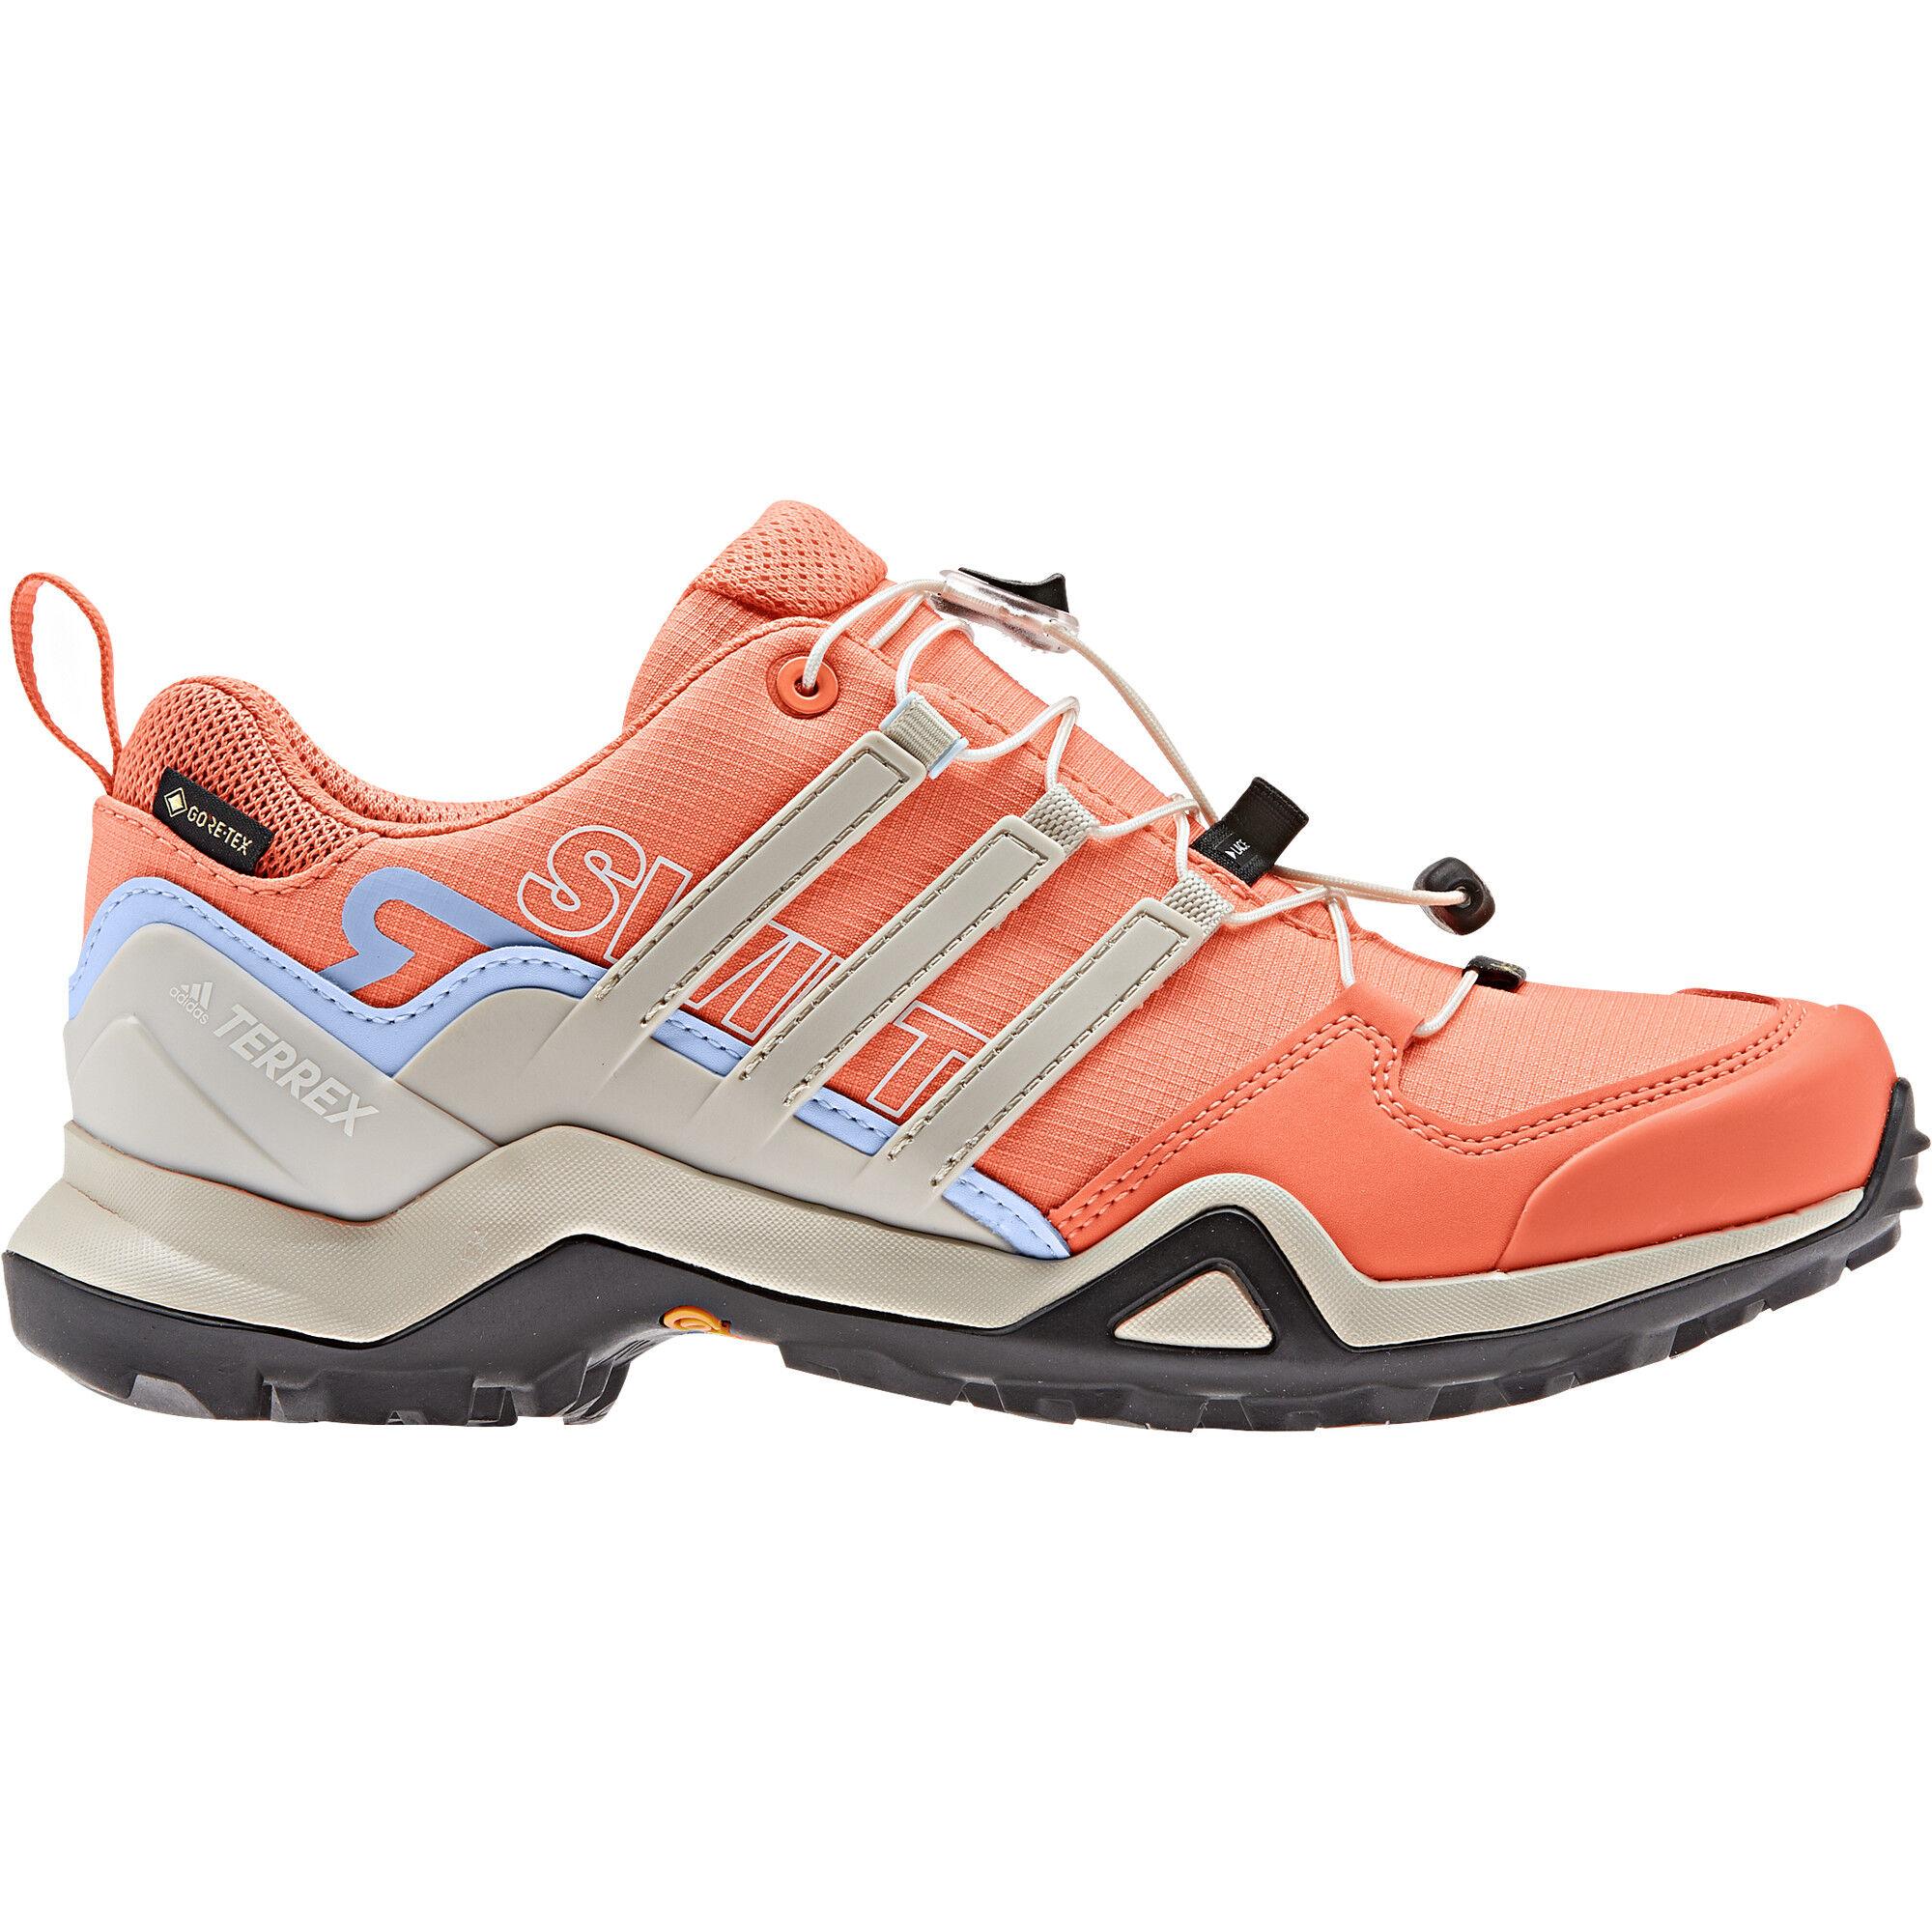 Damen Terrex Speed GTX Schuhe glow blue white coral UK 4